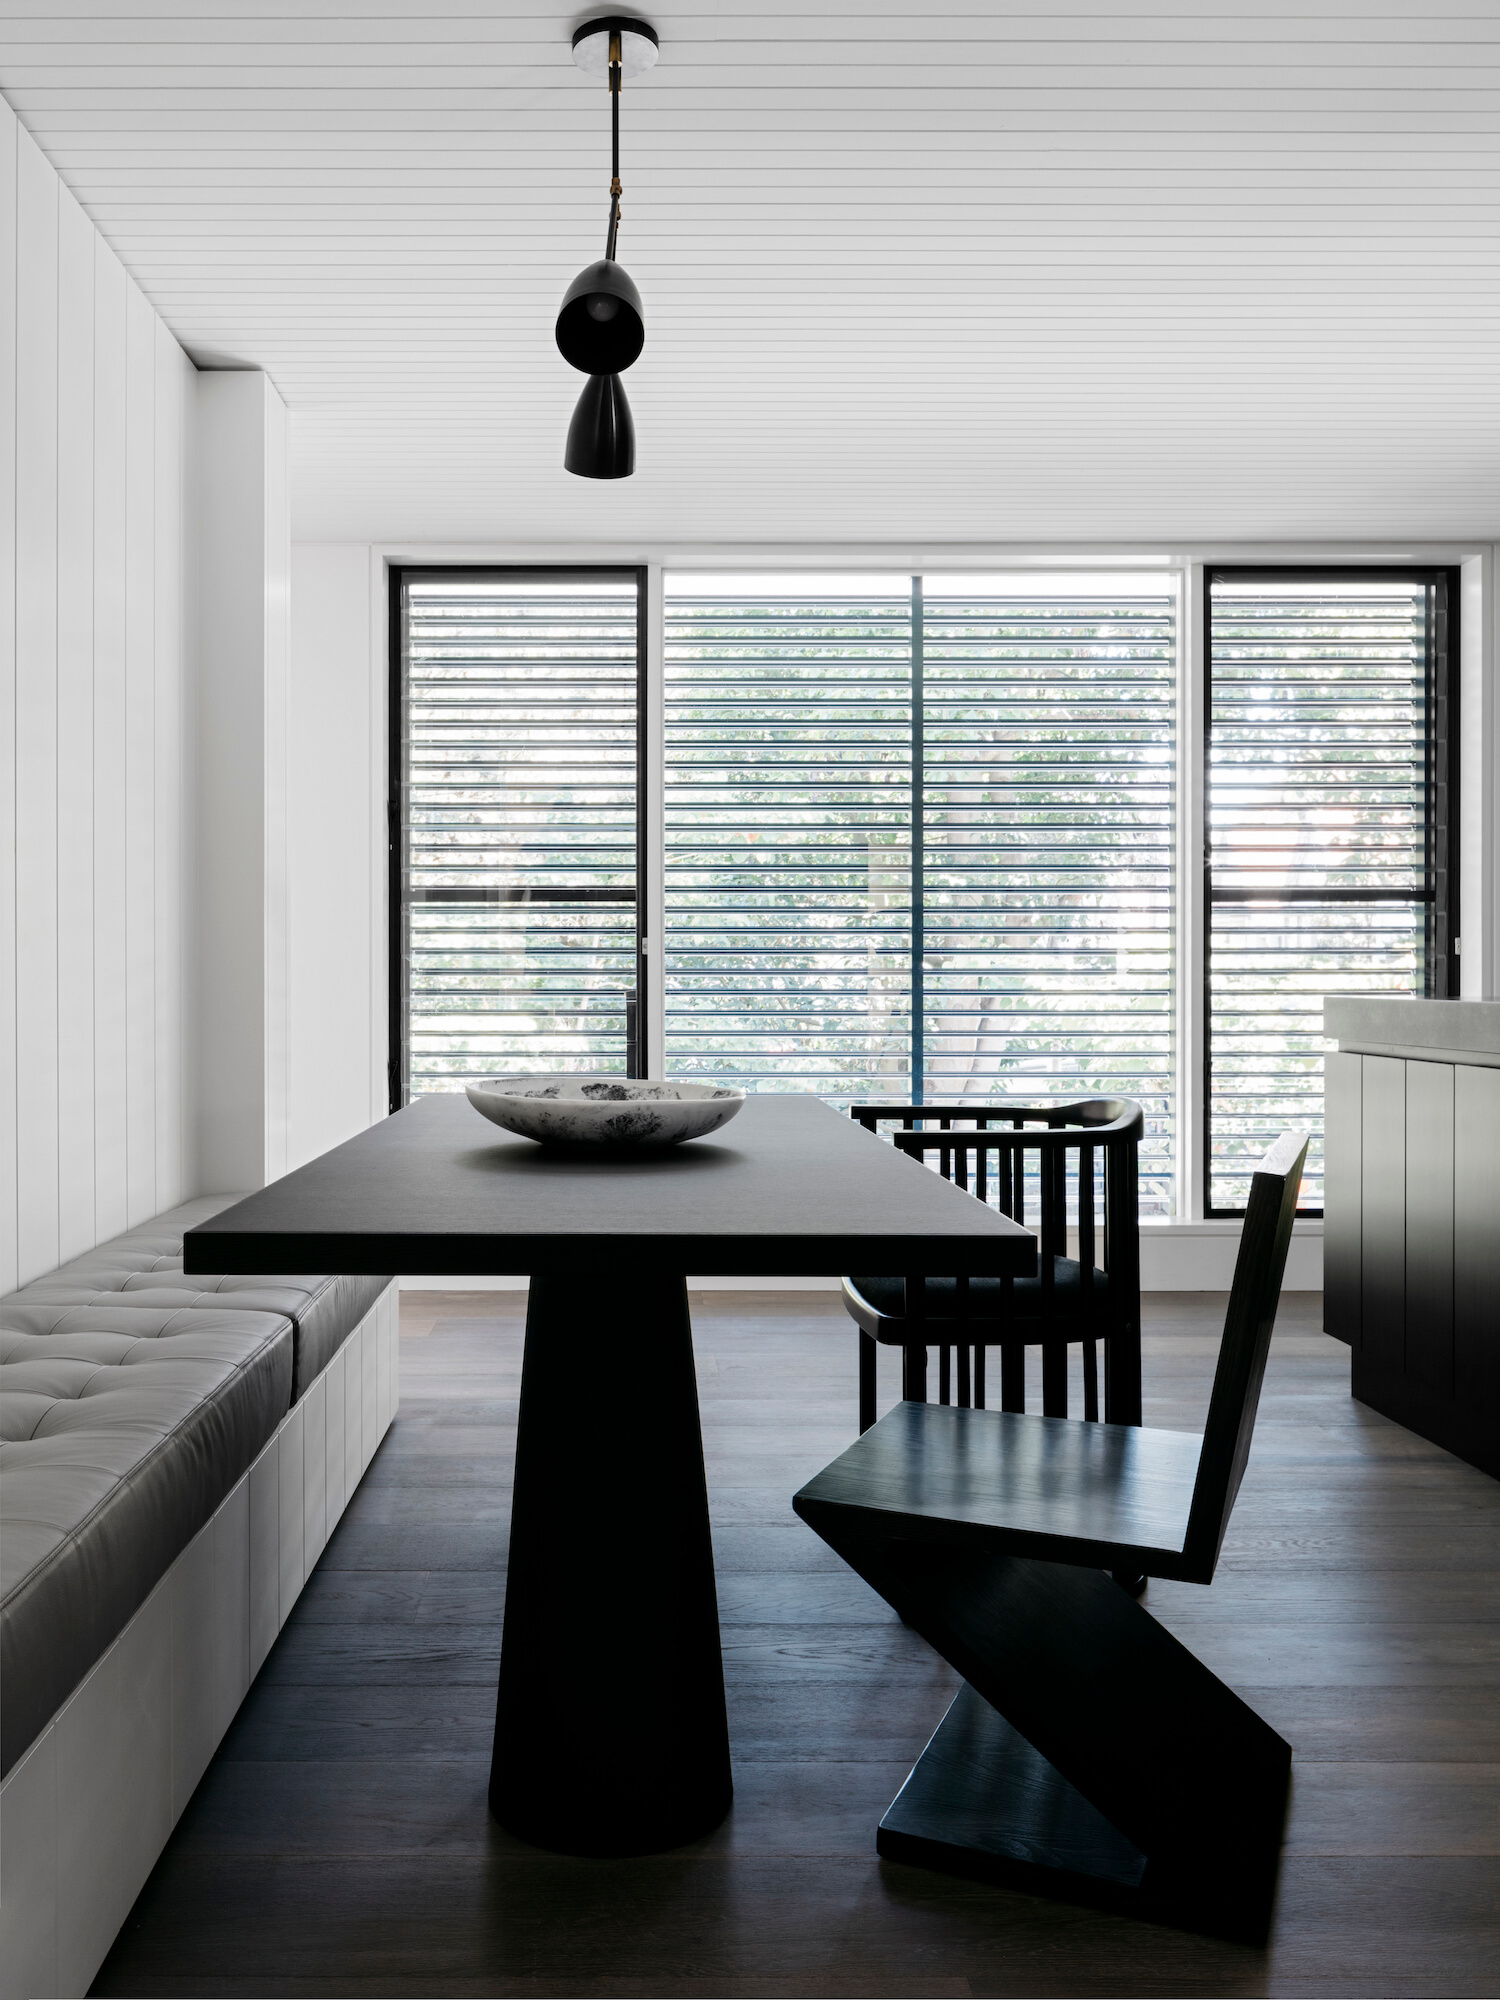 est living woollahra house porebski architects handelsmann khaw 11